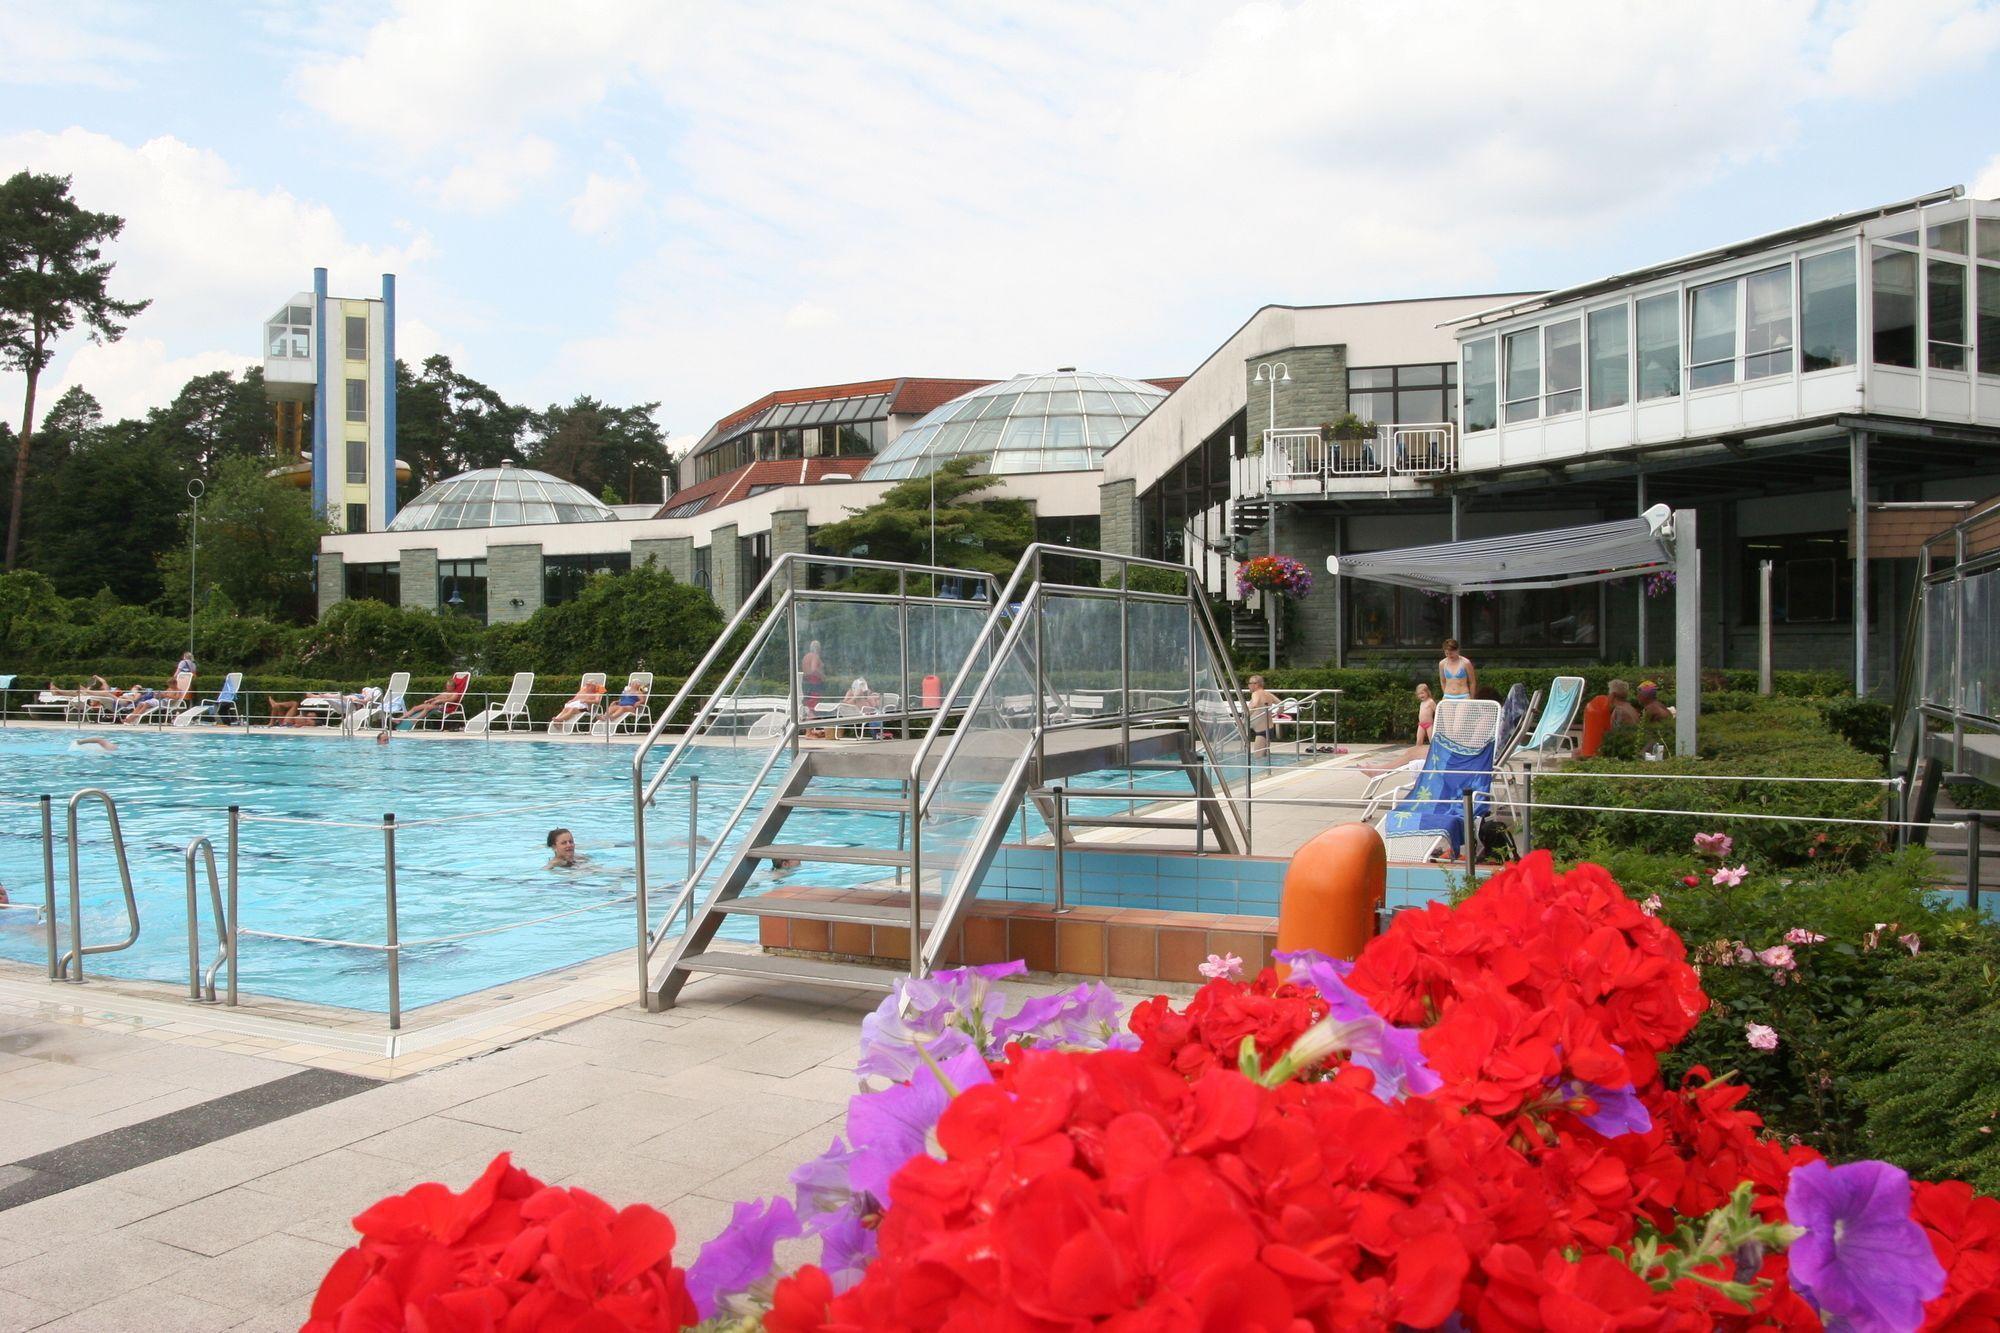 Vital Hotel Hotels In Bad Lippspringe Skyscanner